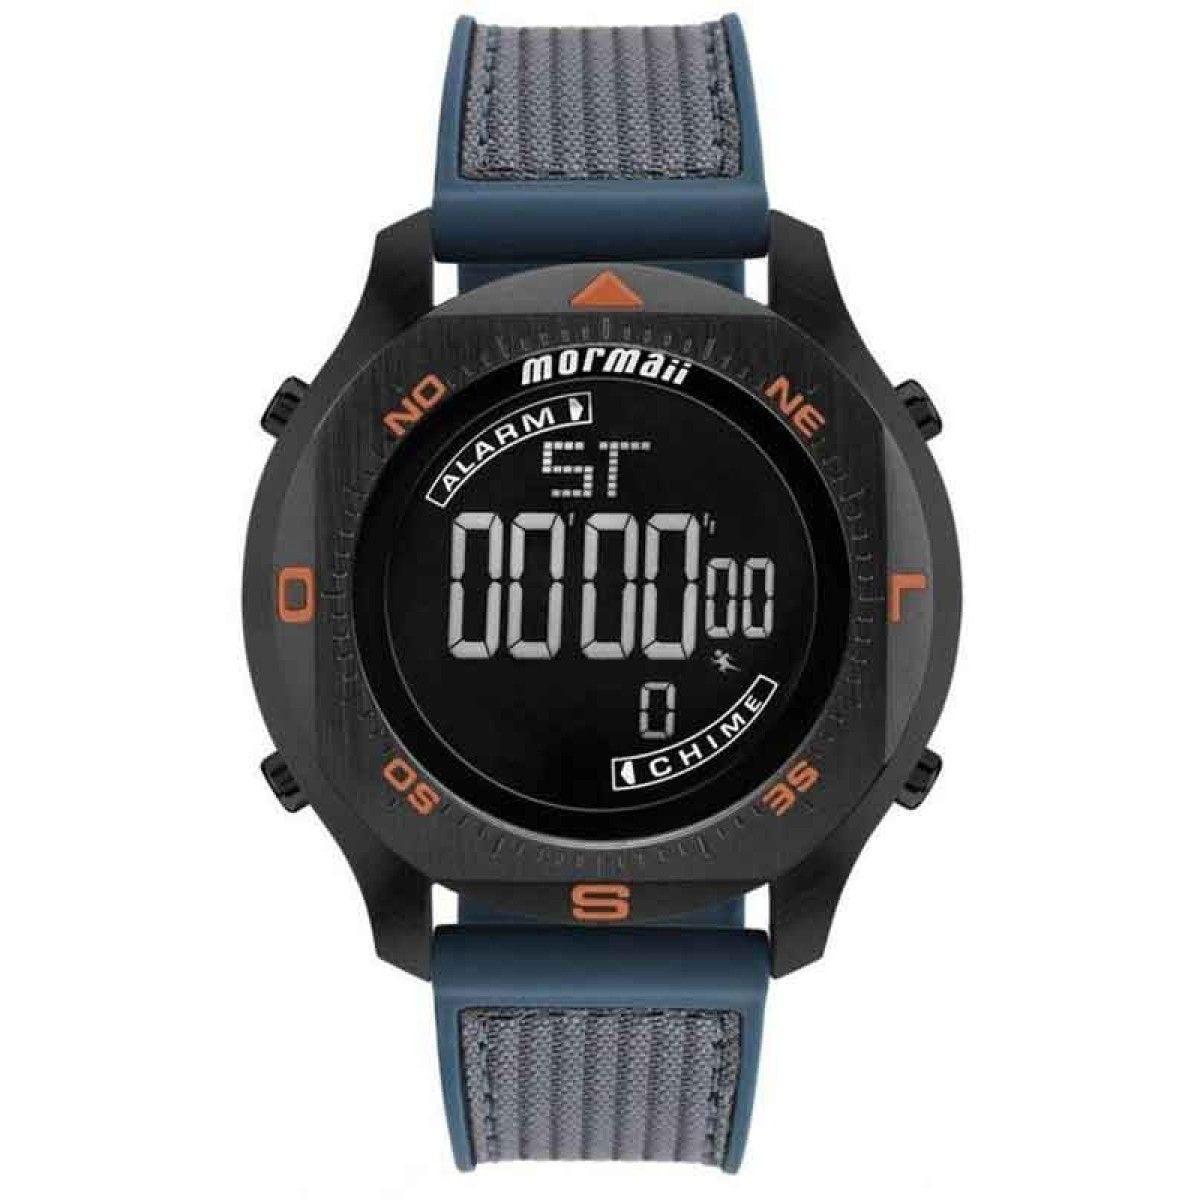 Relógio Mormaii Acqua Pro